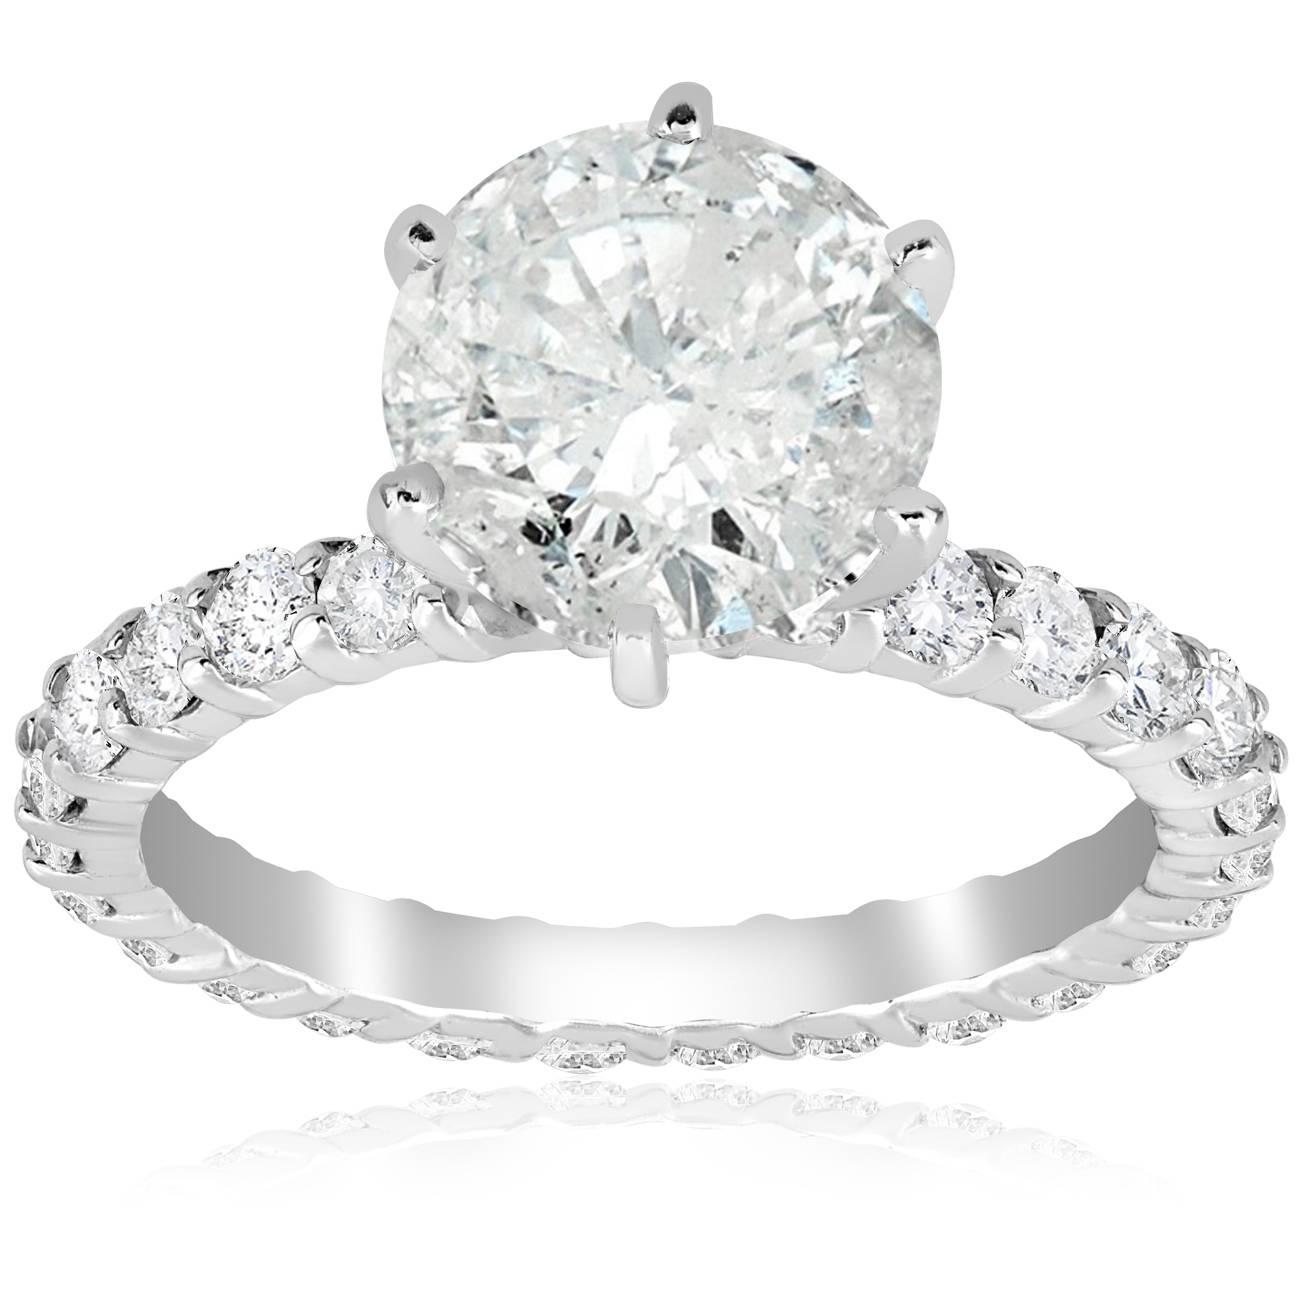 5 Carat Enhanced Diamond Engagement Eternity Ring 14k